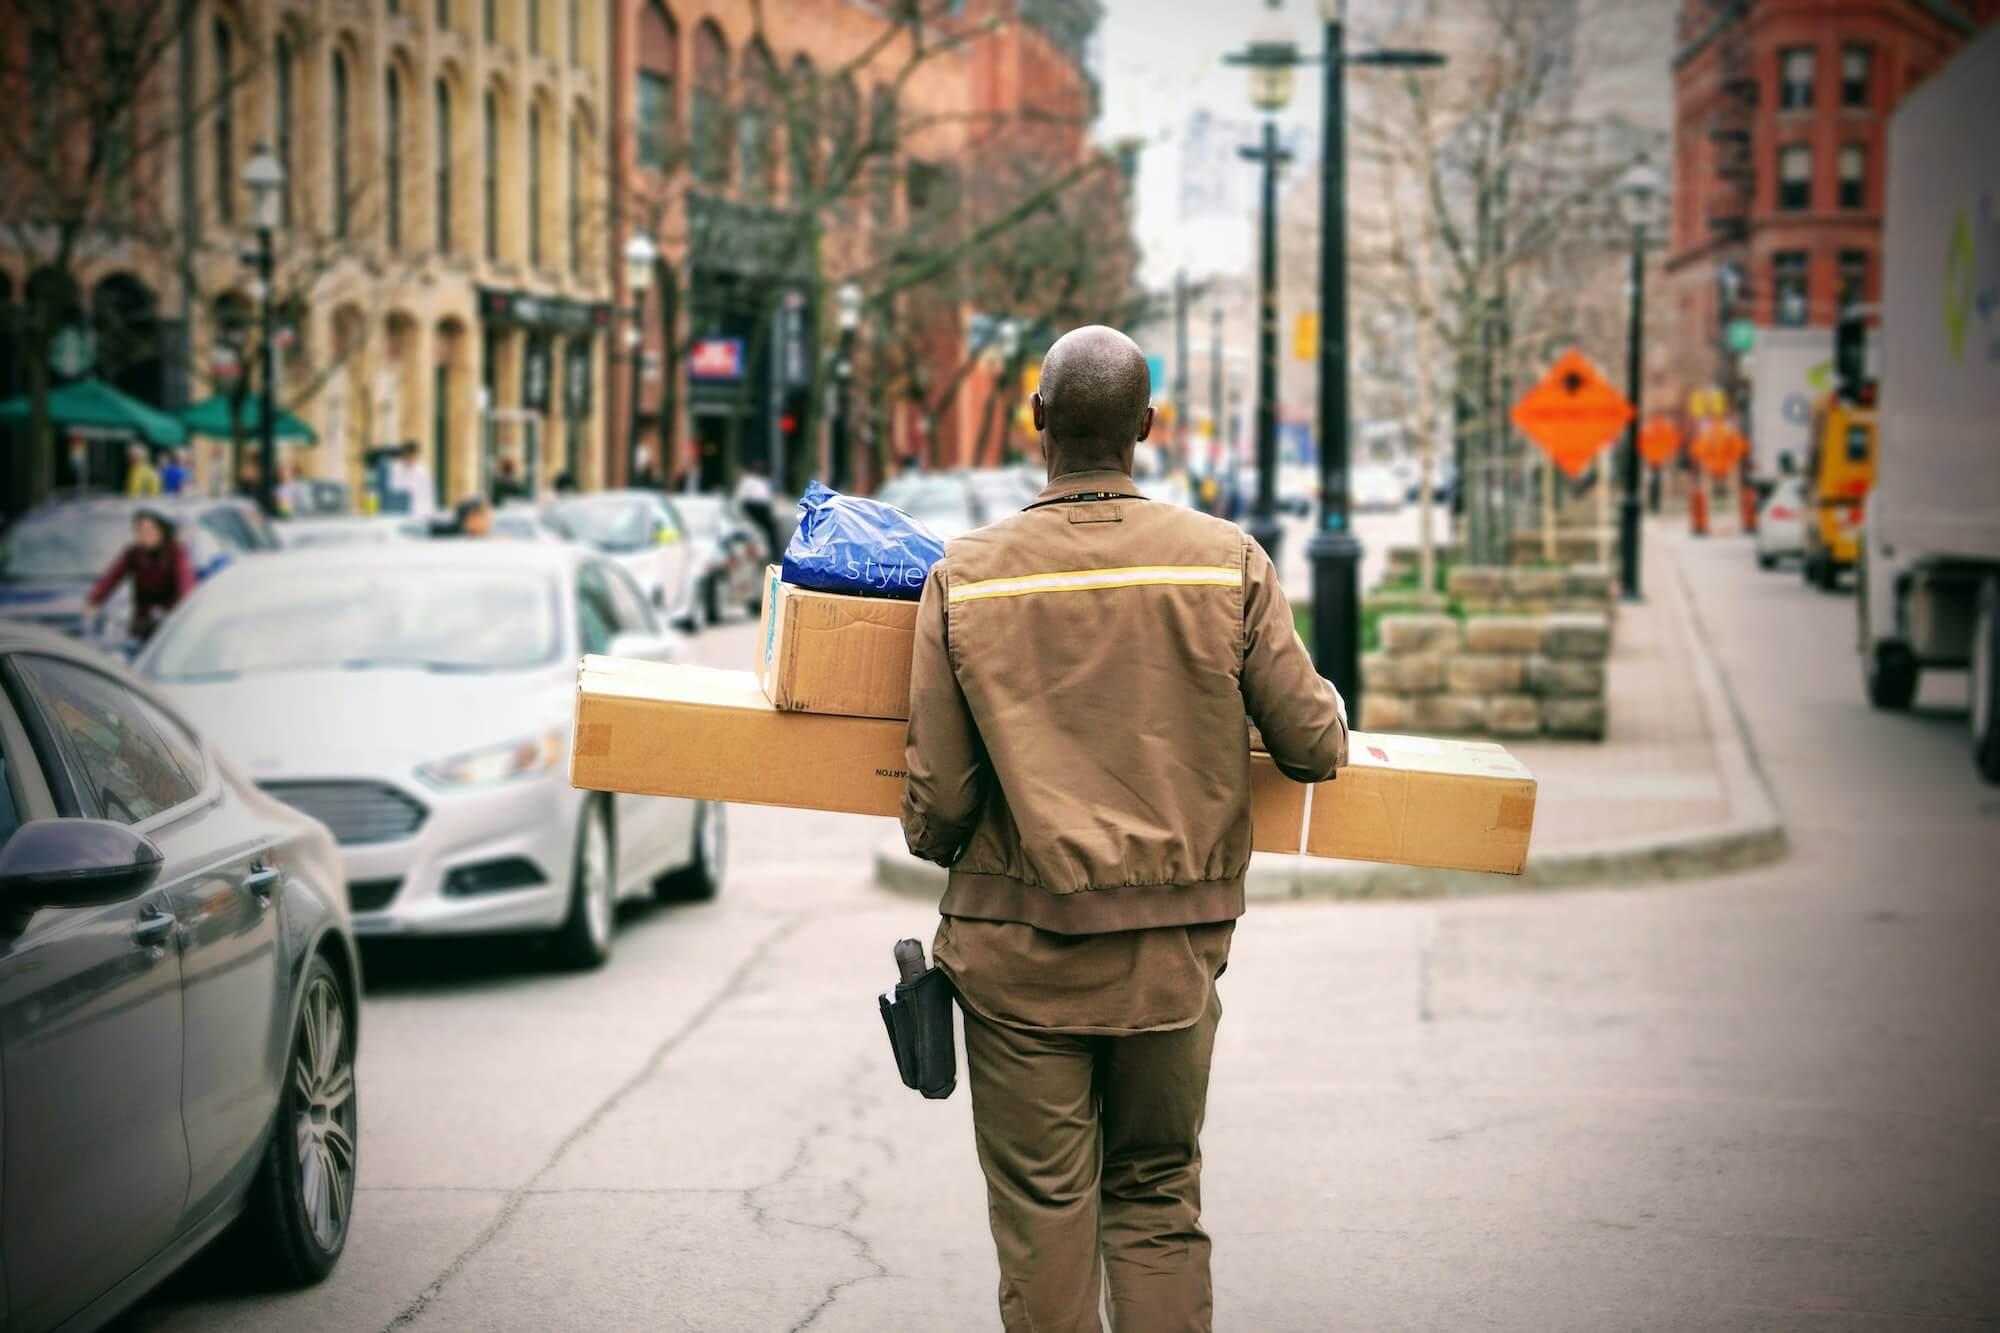 Livreur dans la rue qui tient des cartons